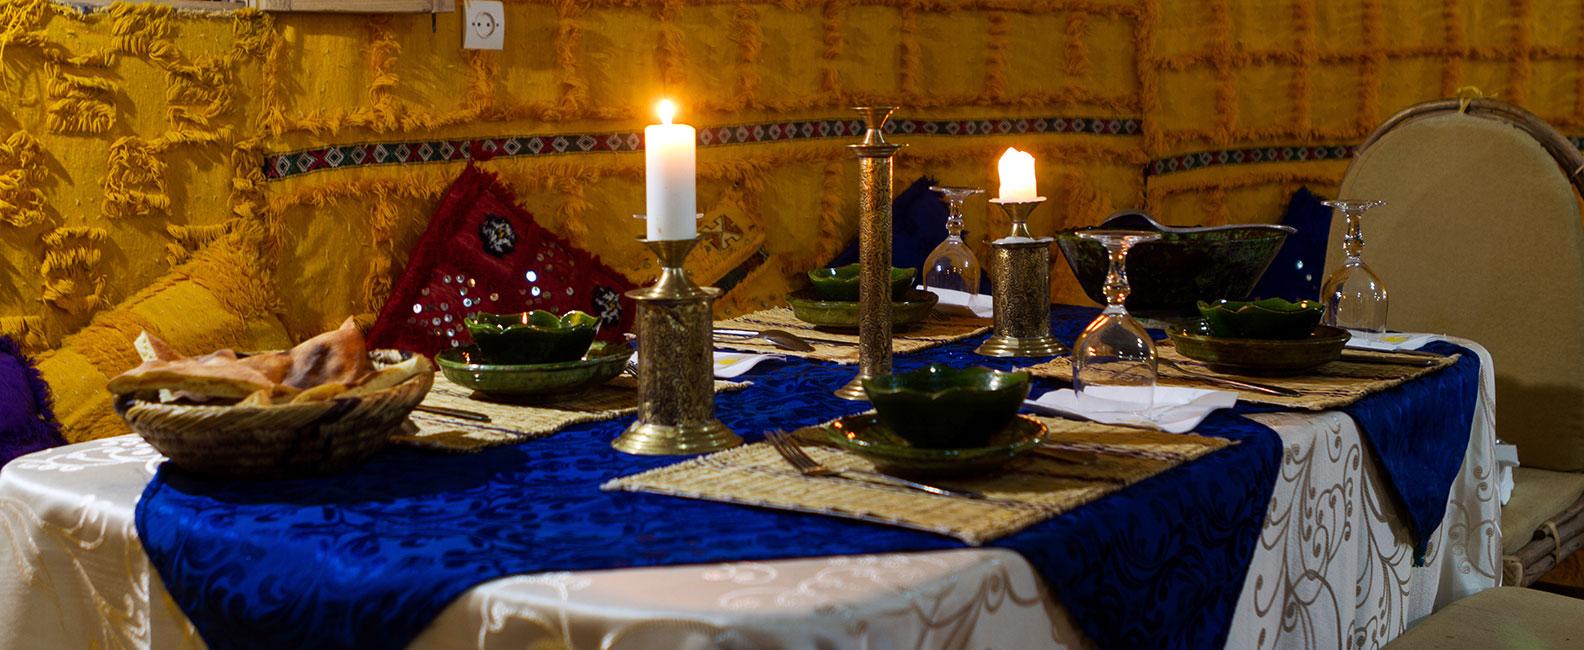 morocco-restaurant-food